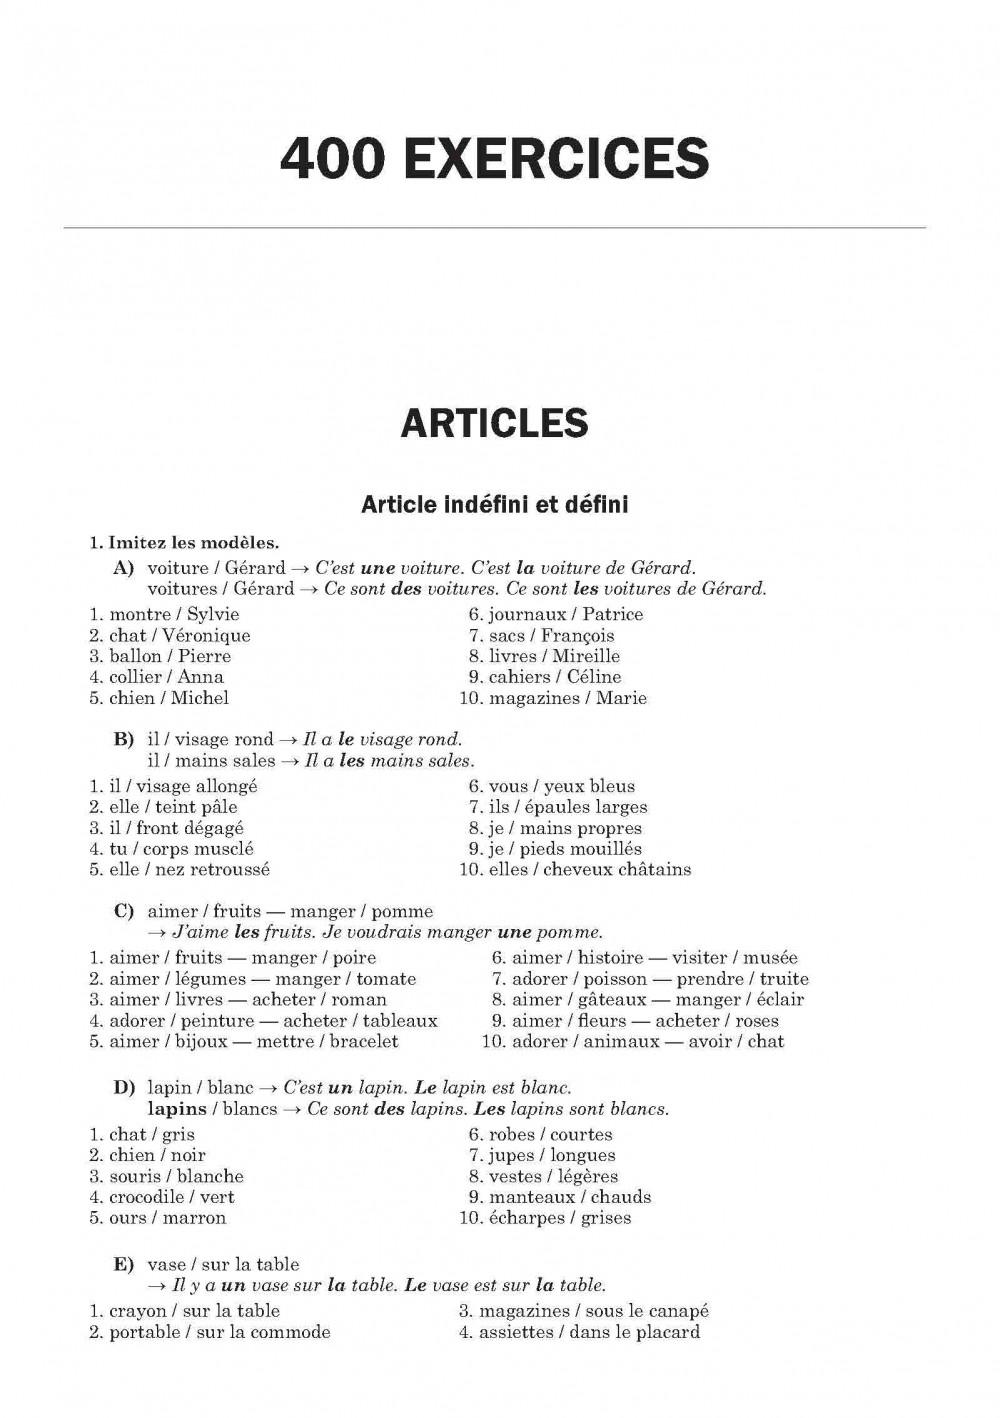 гдз по французскому грамматика иванченко сборник упражнений